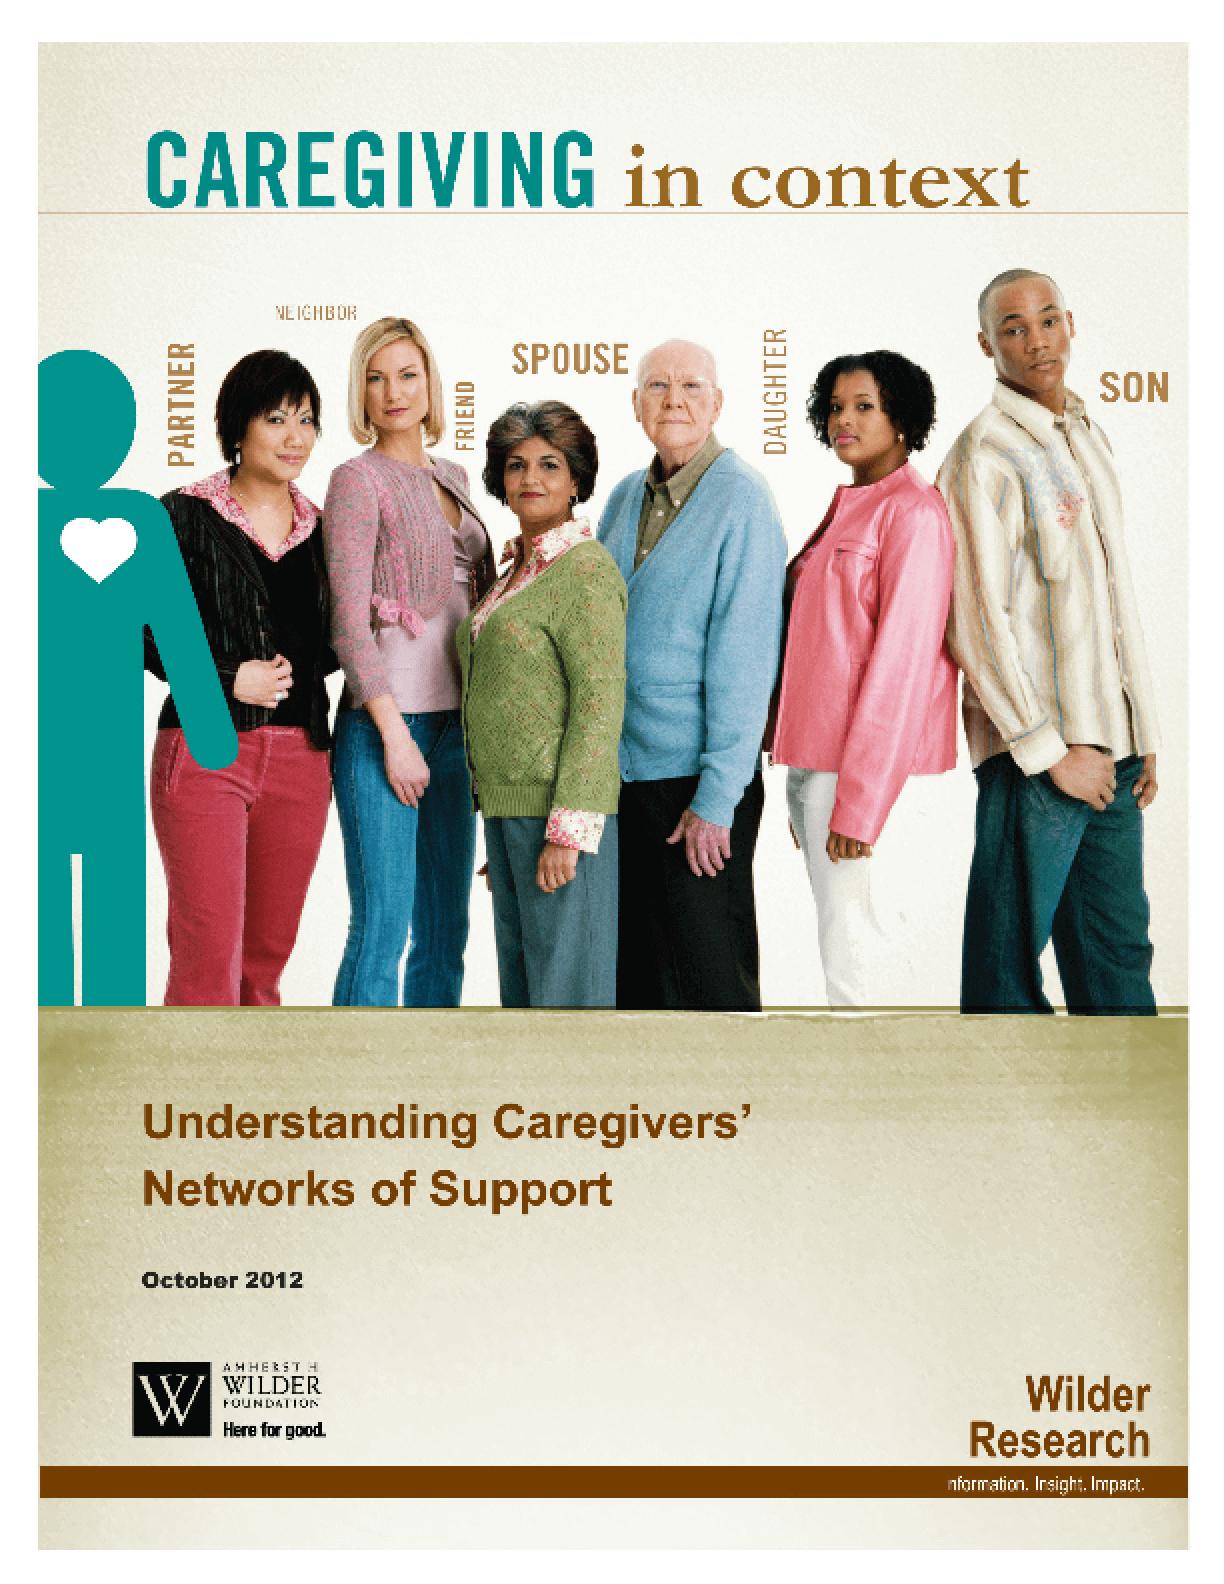 Caregiving in Context: Understanding Caregivers' Networks of Support